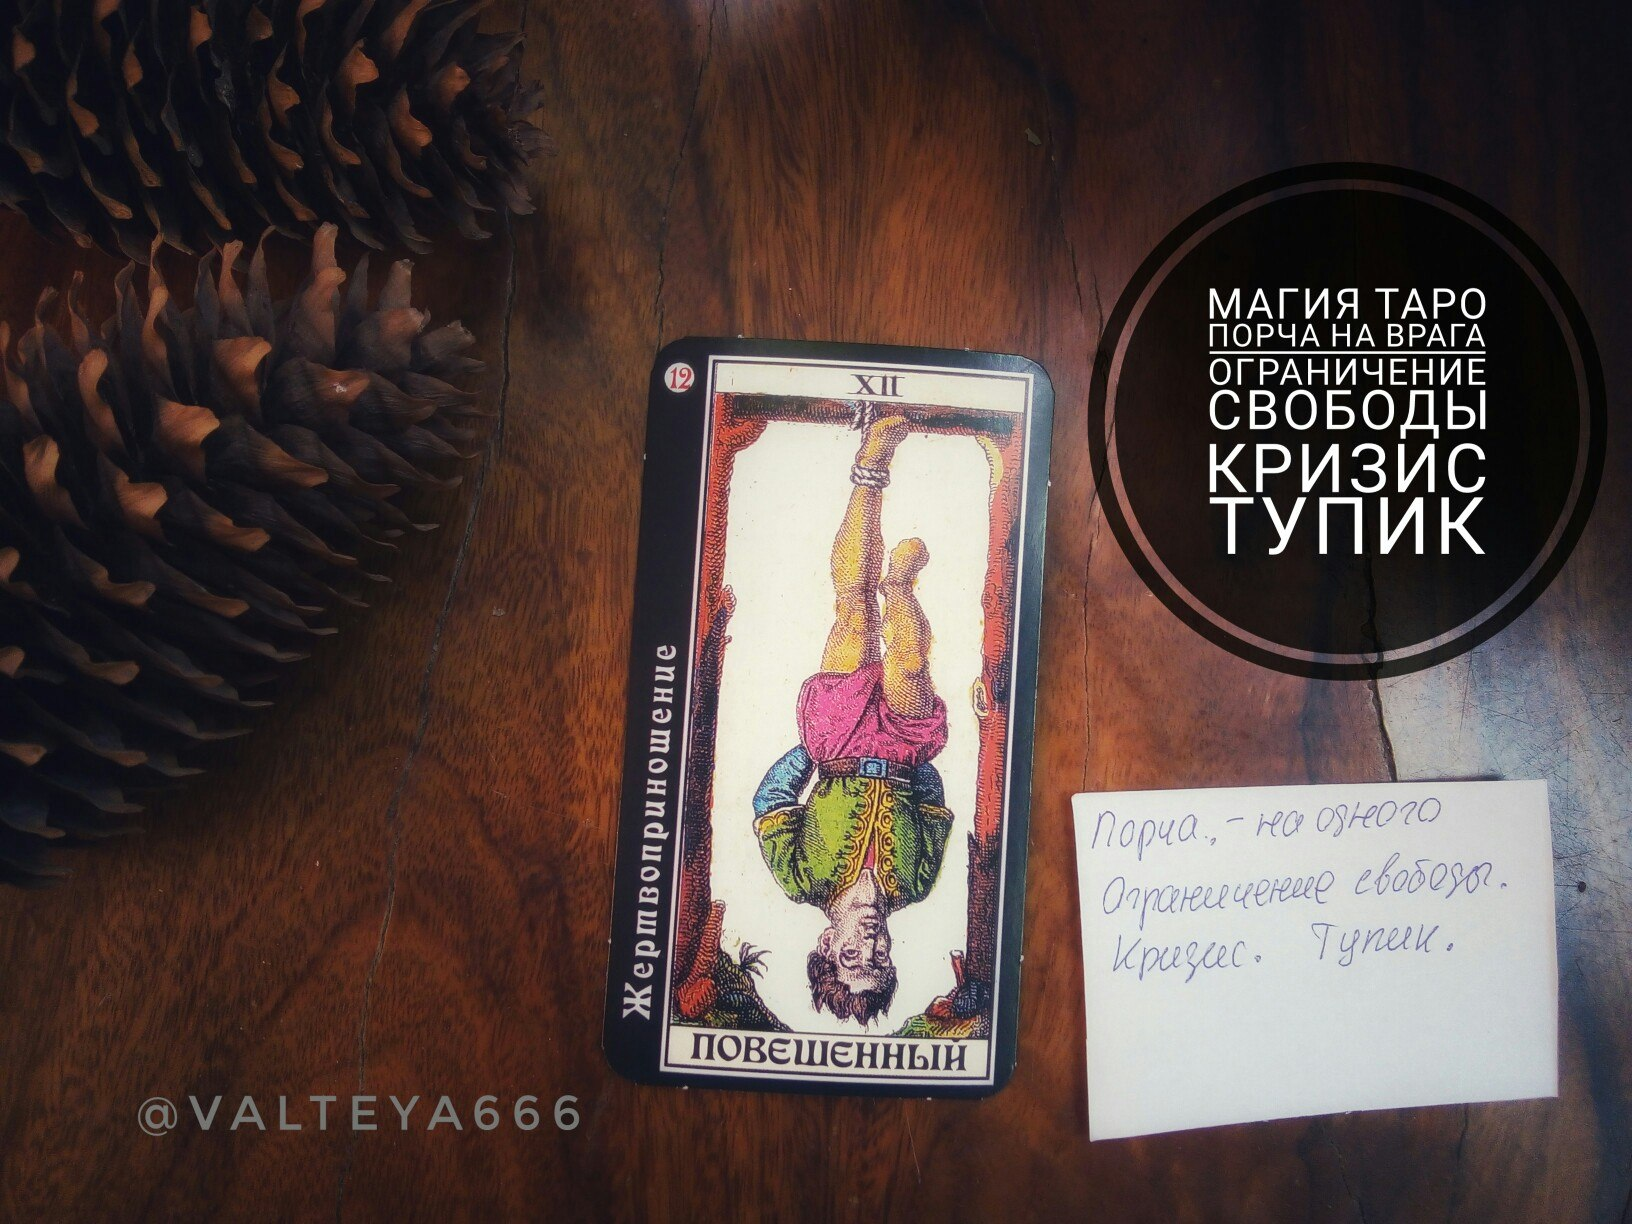 Хештег таро на   Салон Магии и мистики Елены Руденко ( Валтеи ). Киев ,тел: 0506251562  XB9XuKnEQUc